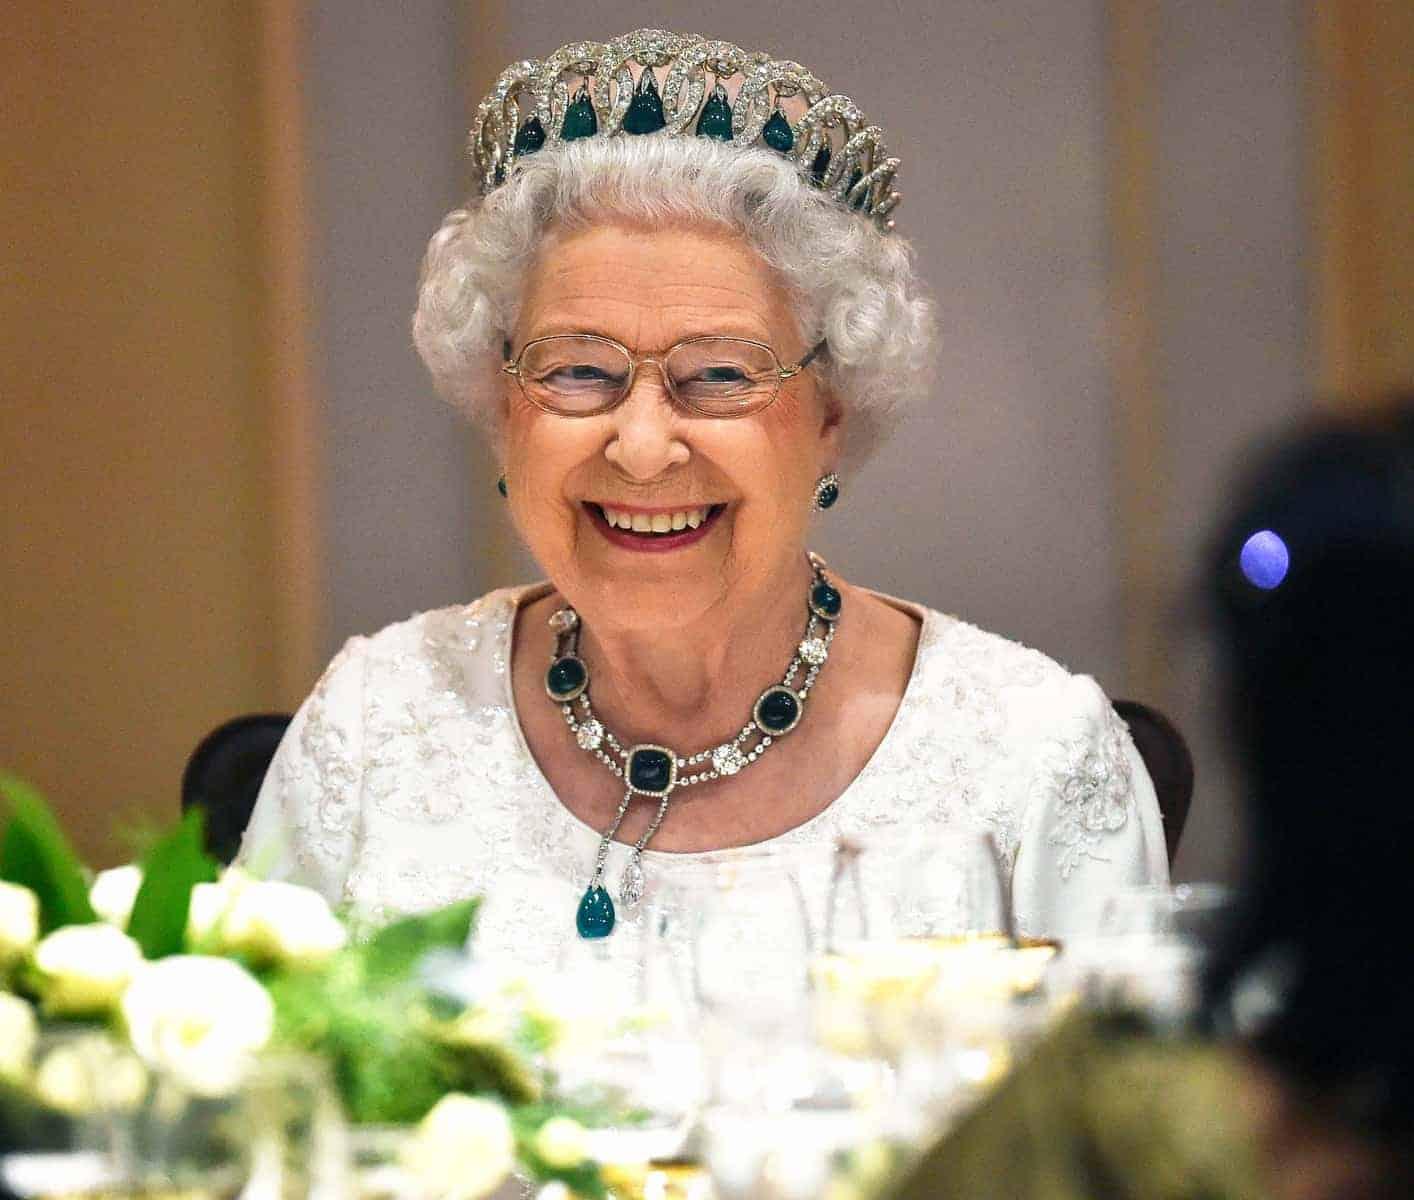 Queen Elizabeth was crowned in February 1952.